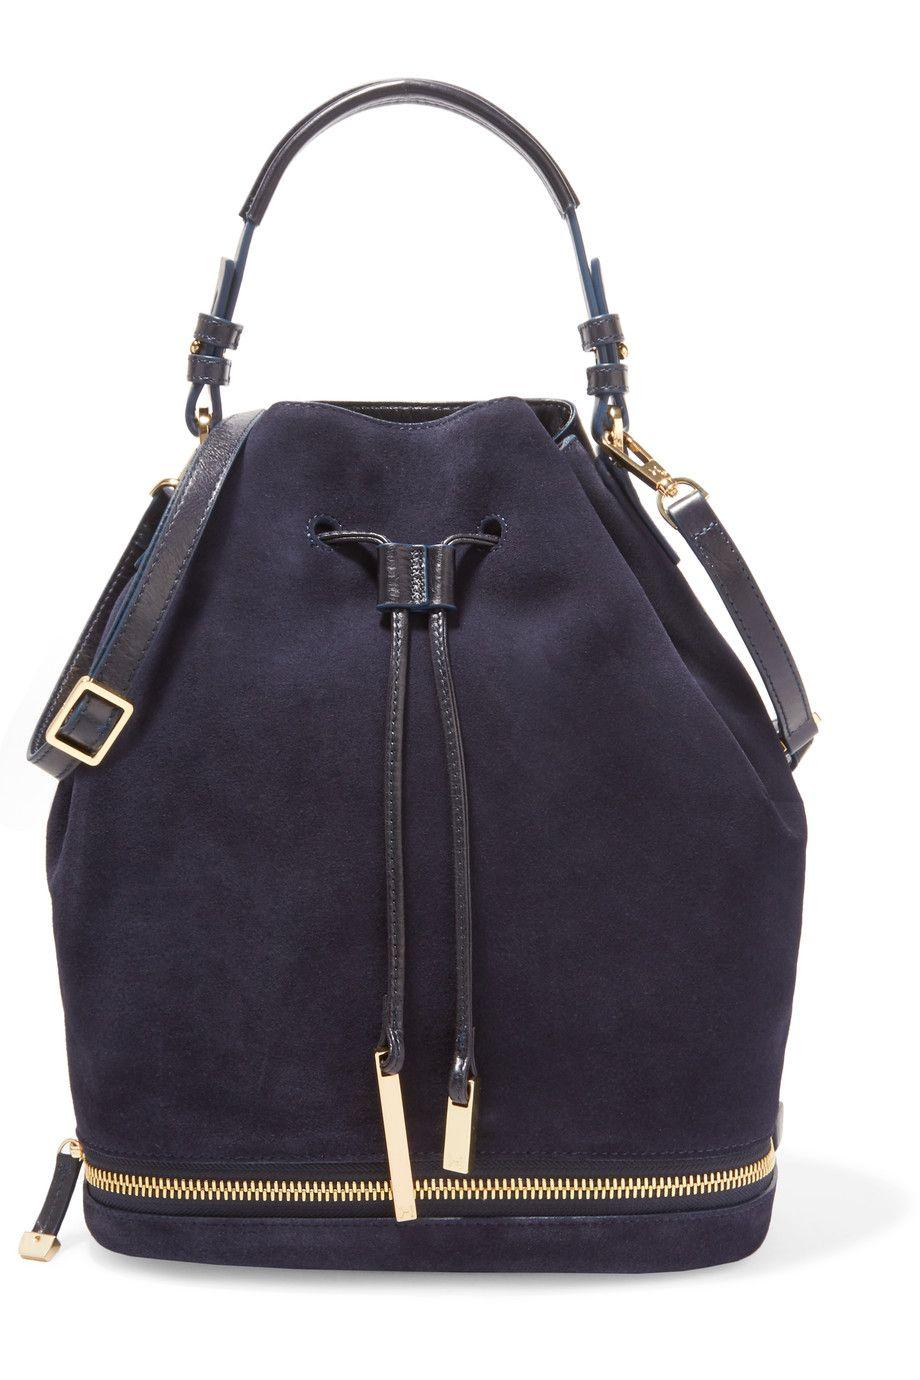 99f68b400c20 HALSTON HERITAGE Suede And Textured-Leather Bucket Bag.  halstonheritage   bags  shoulder bags  hand bags  bucket  suede